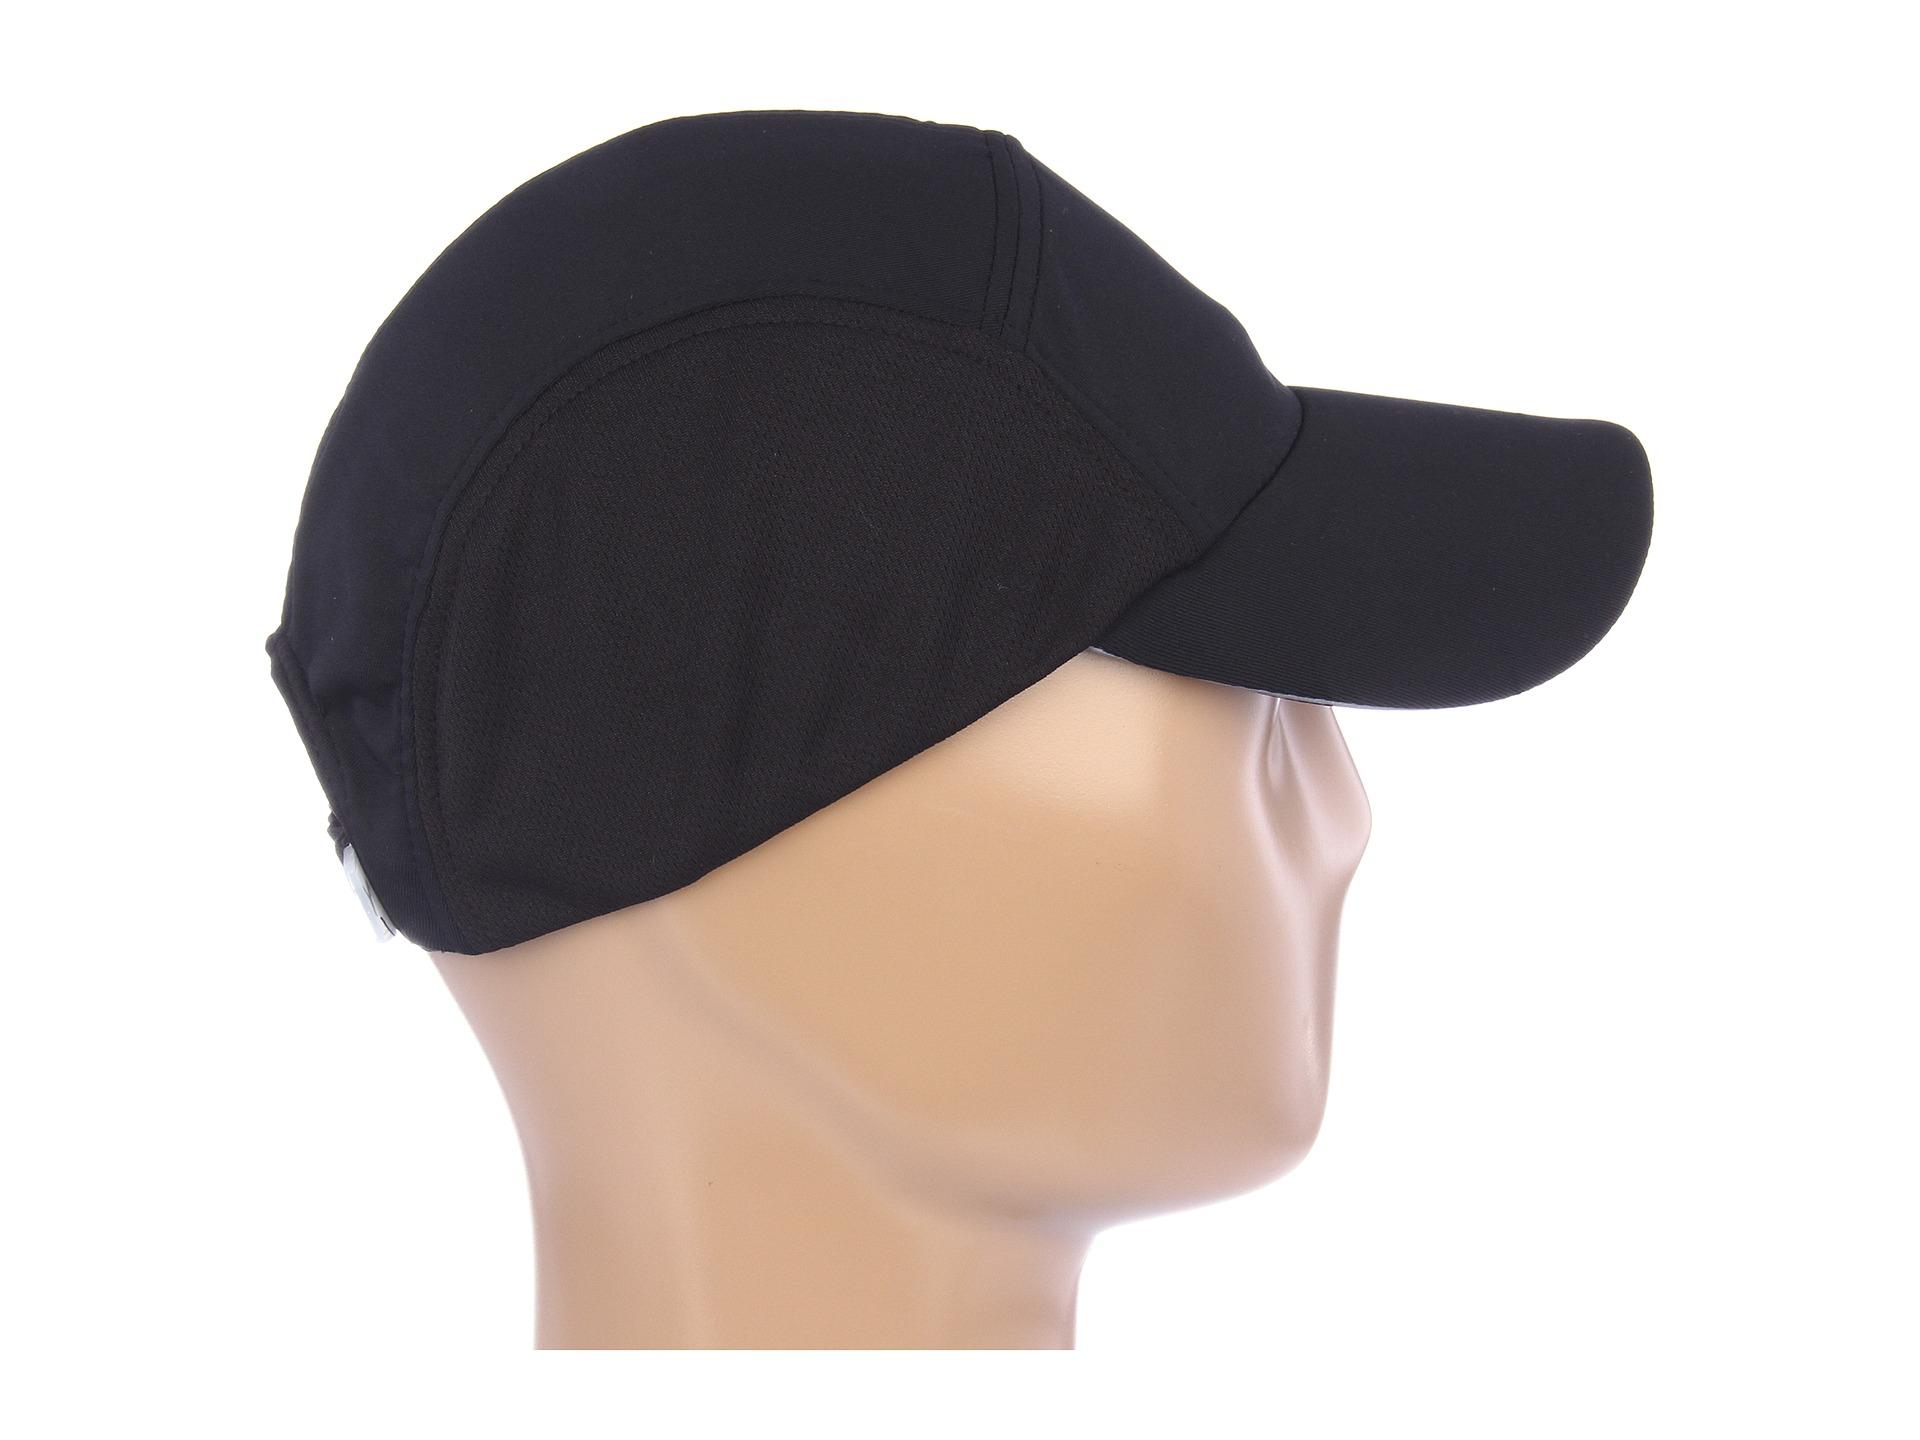 f45bb9466 PUMA Lightweight Performance Apex Running Cap in Black for Men - Lyst